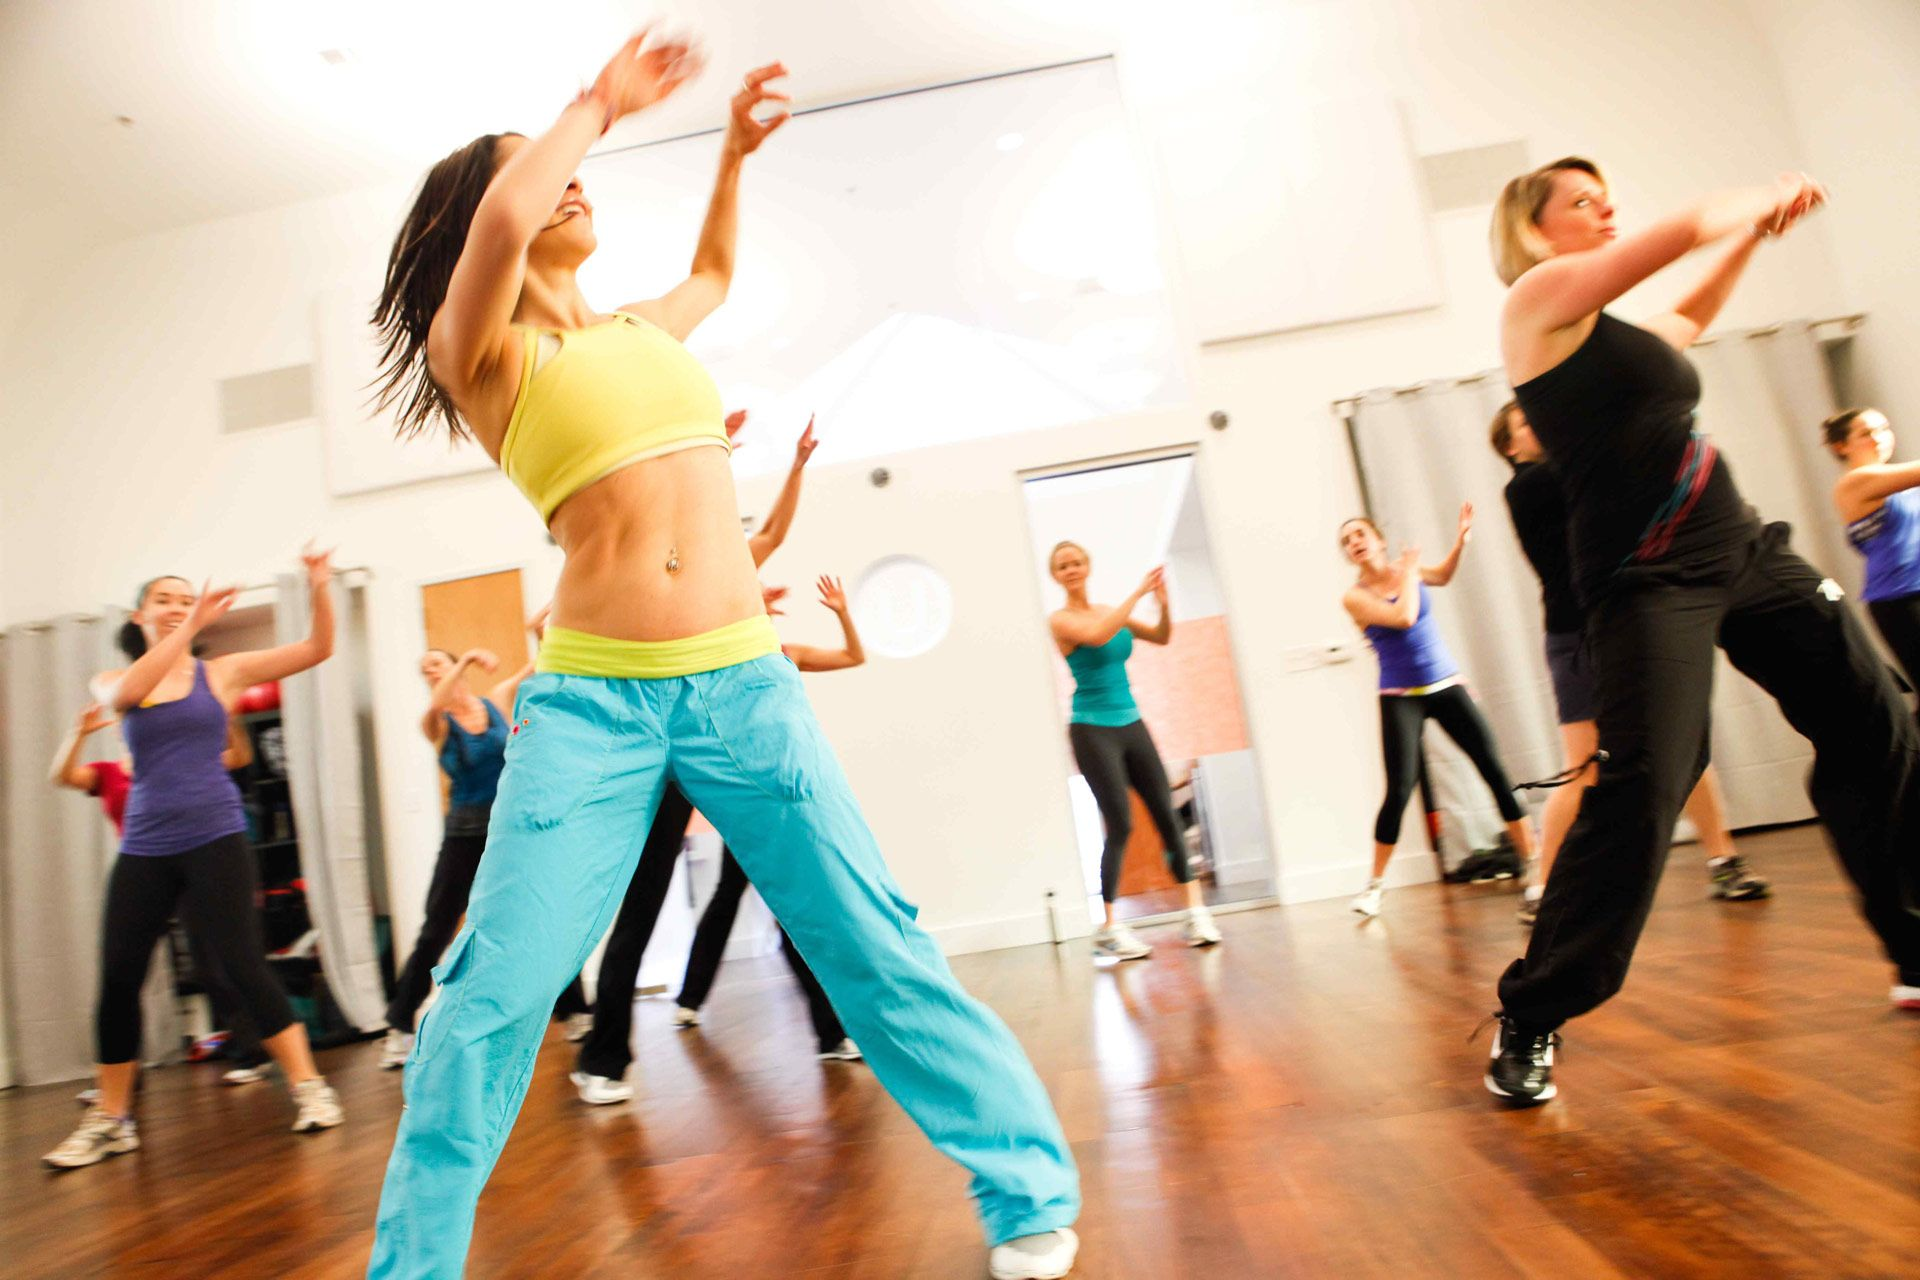 Una lezione di Zumba per allenarsi in casa (video)